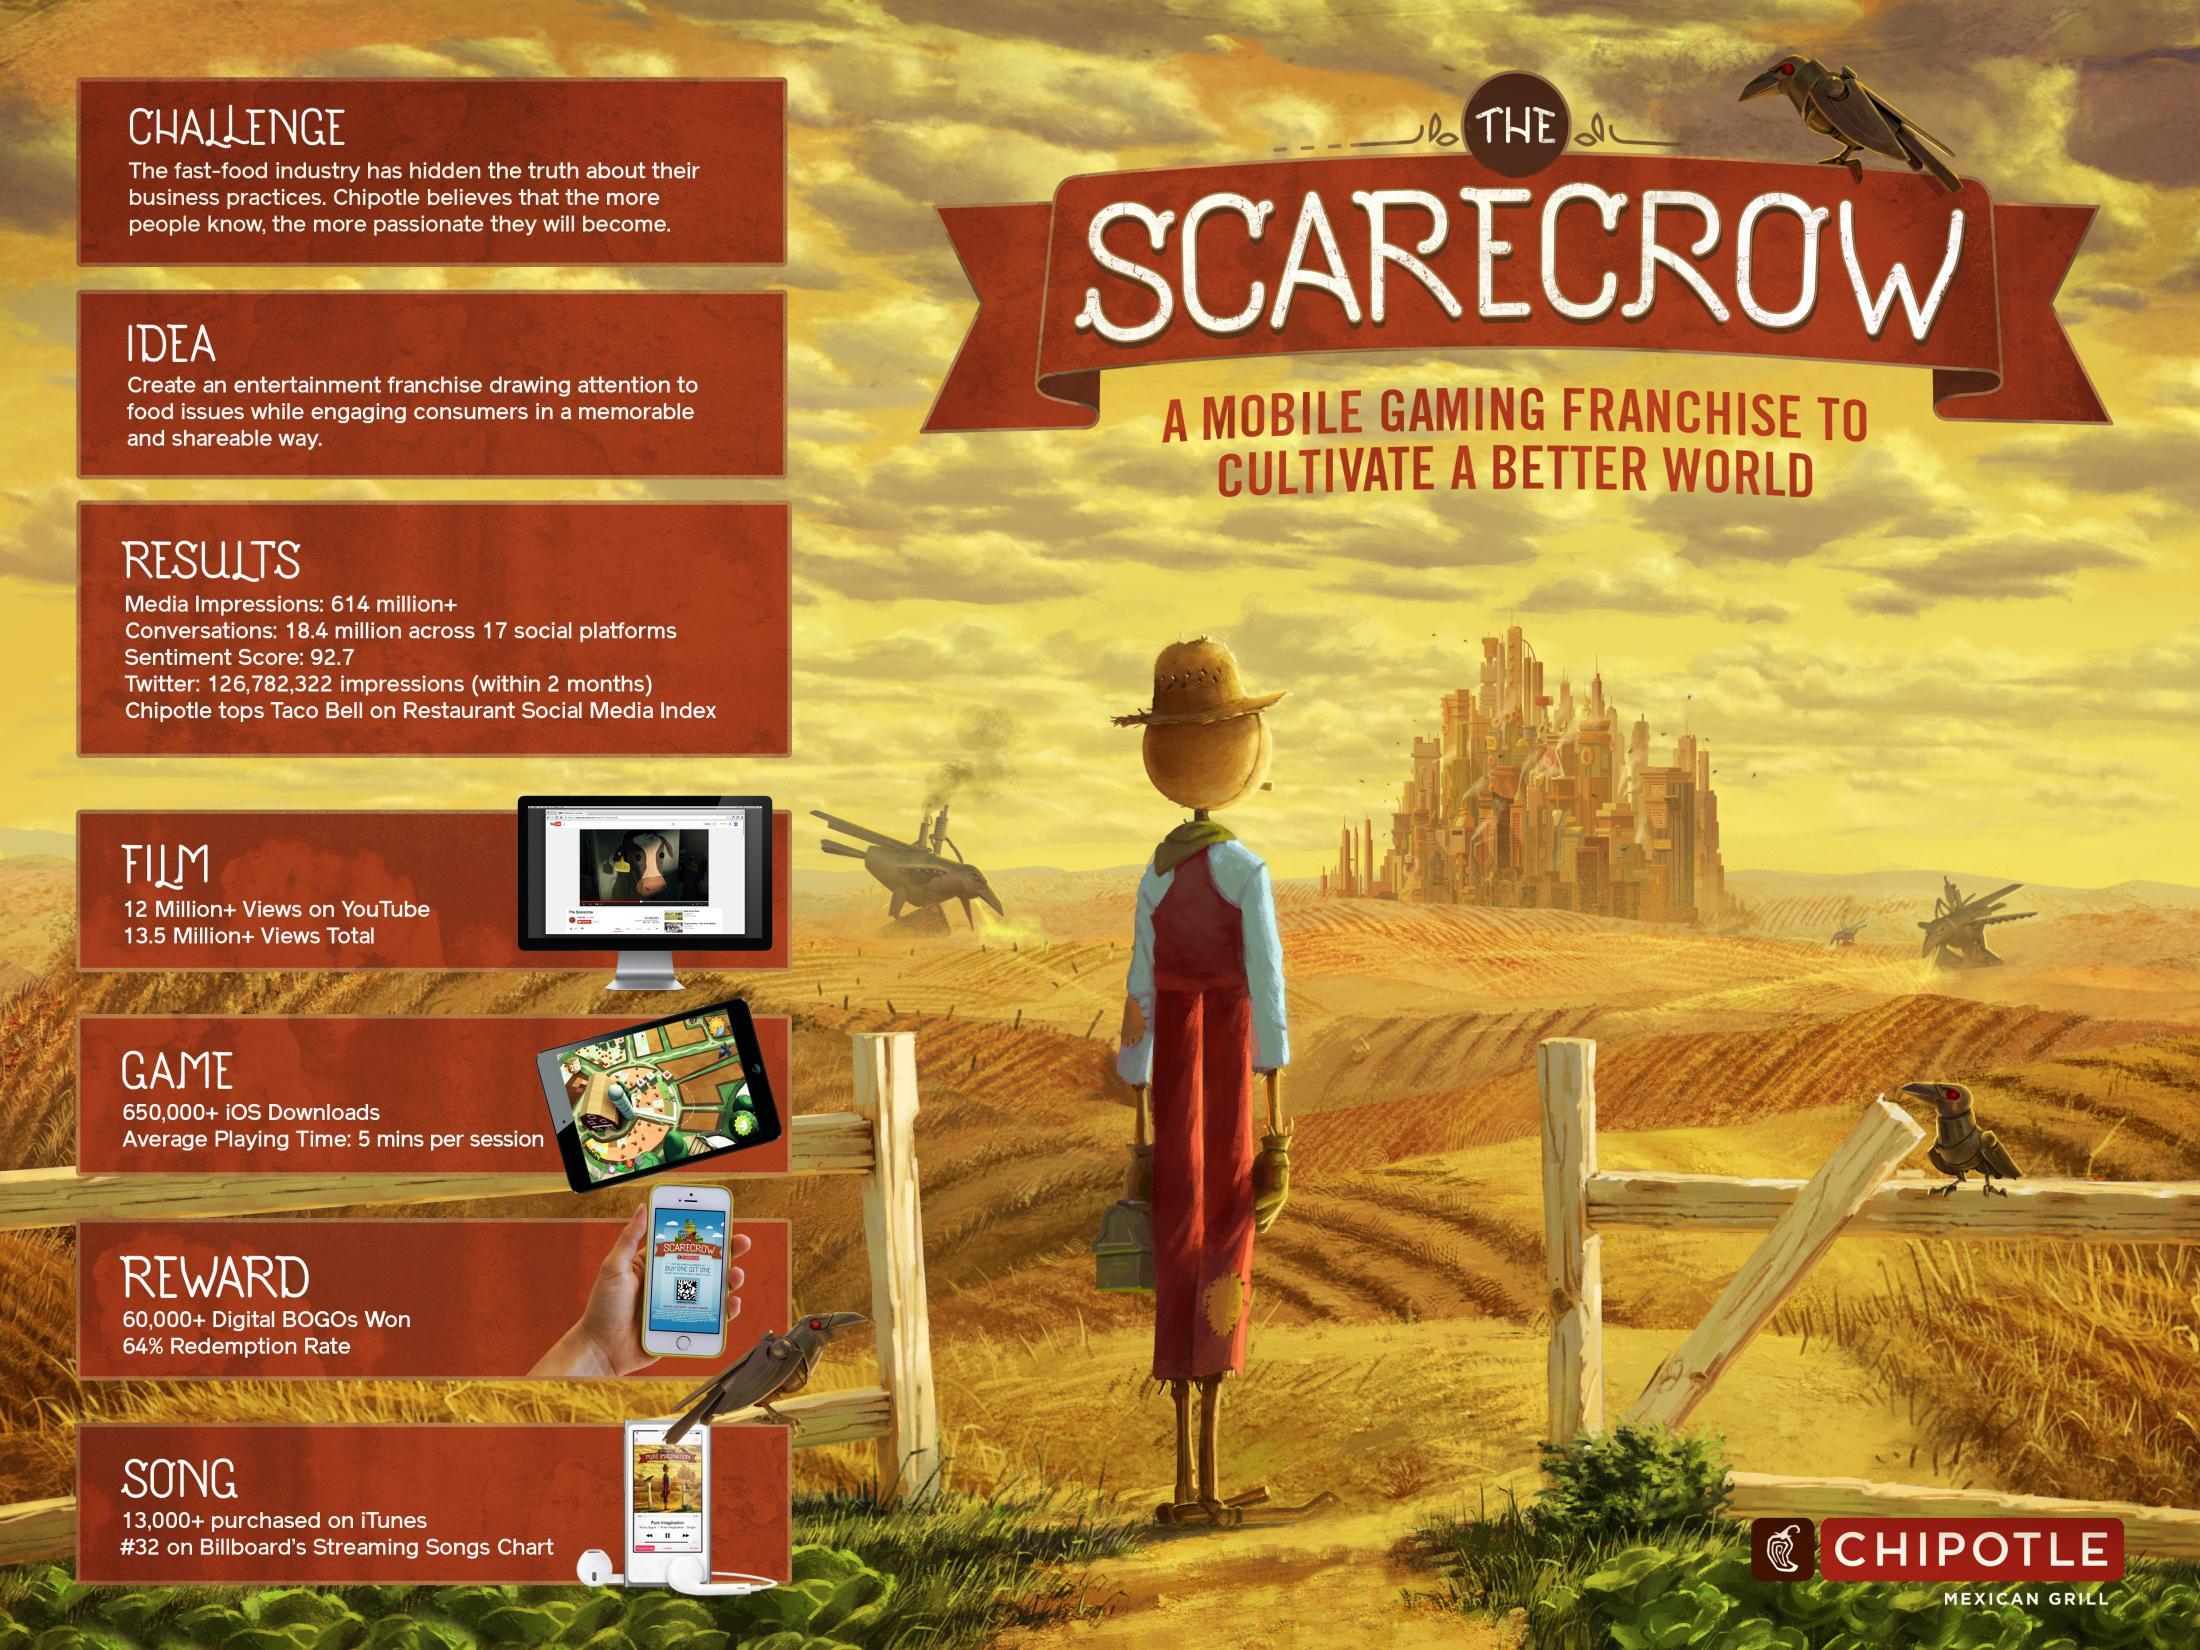 Thumbnail for The Scarecrow